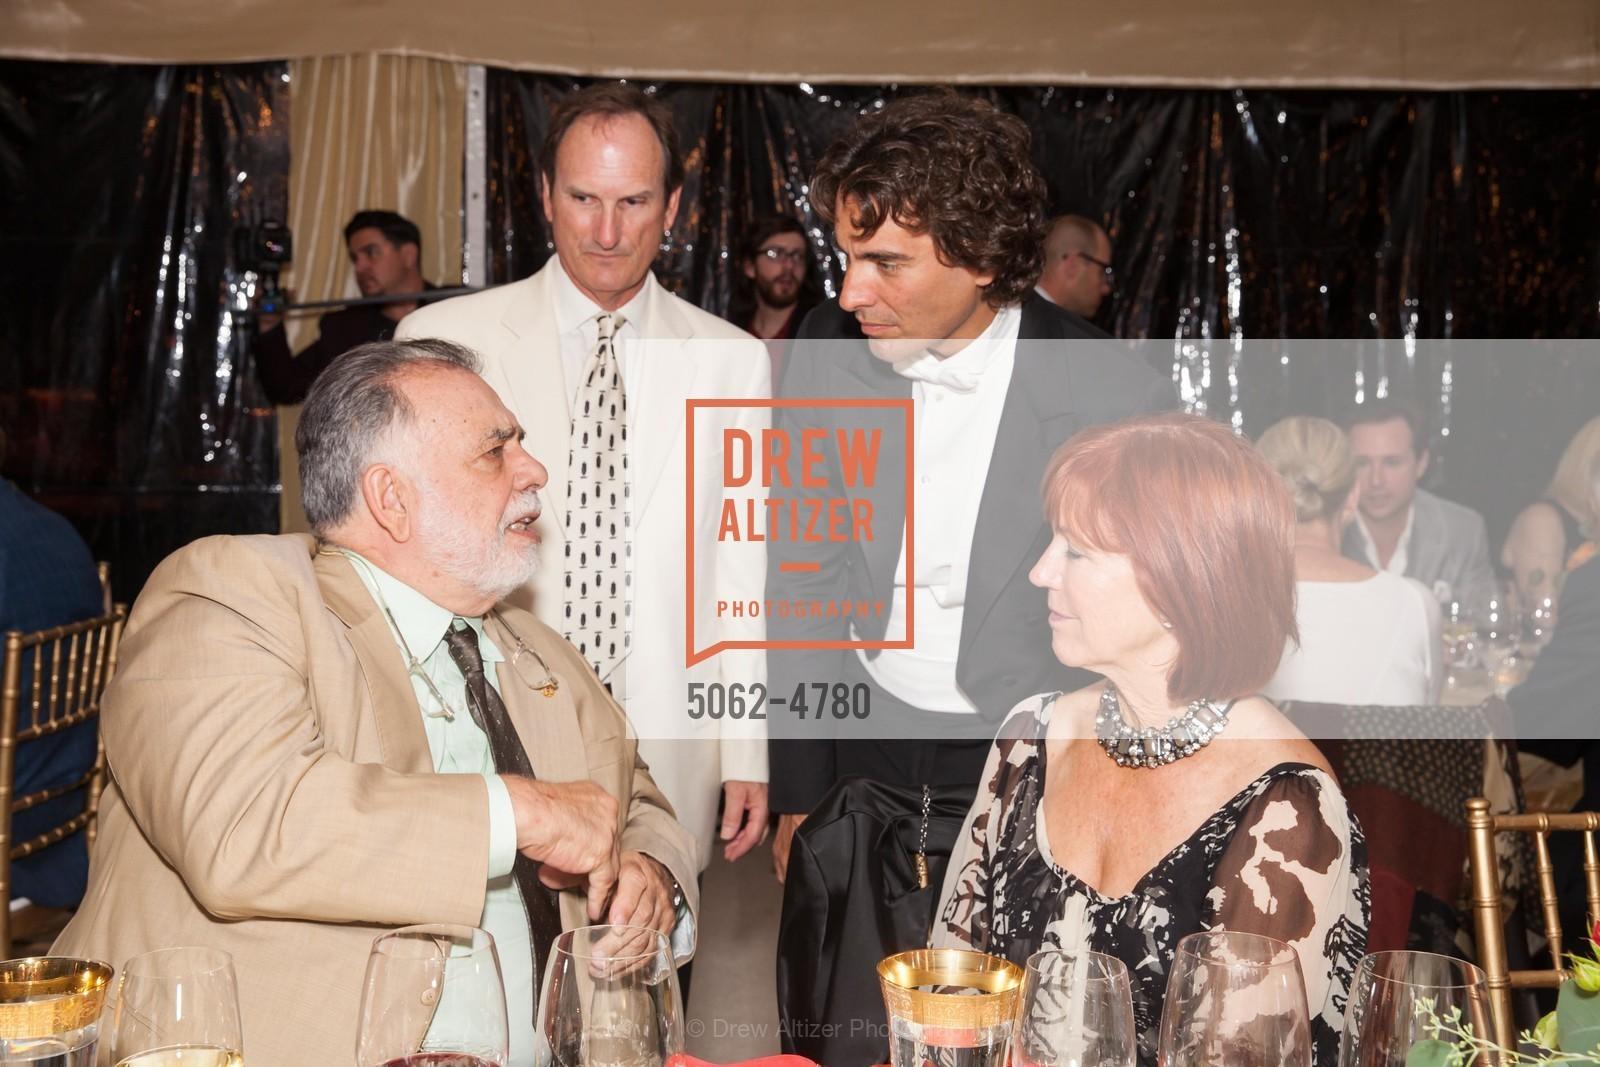 Francis Coppola, Larry Maguirre, Carlo Ponti, Karen Maguirre, Photo #5062-4780